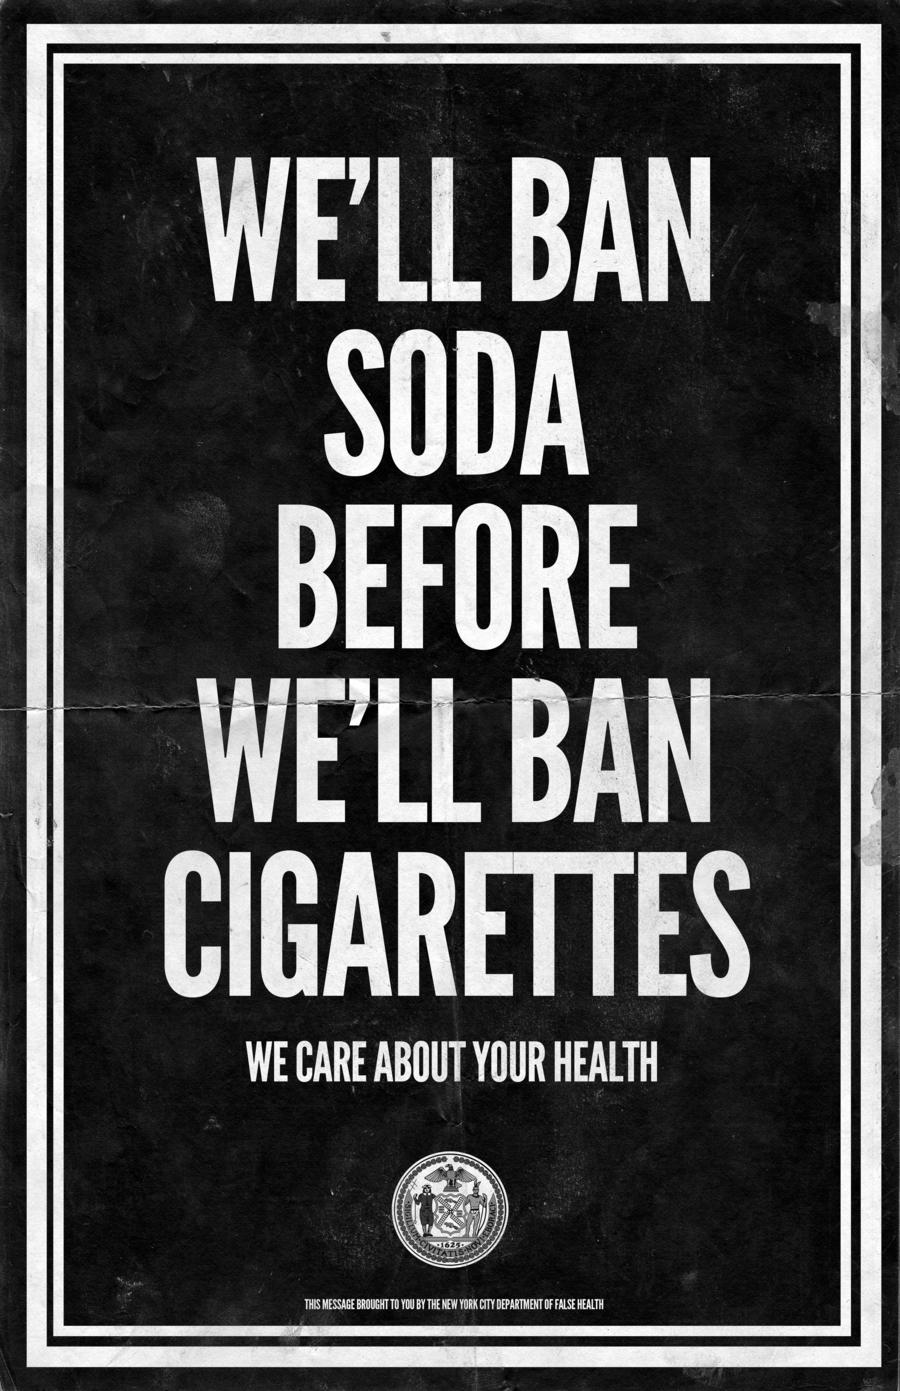 We'll Ban Soda before we ban Cigarettes